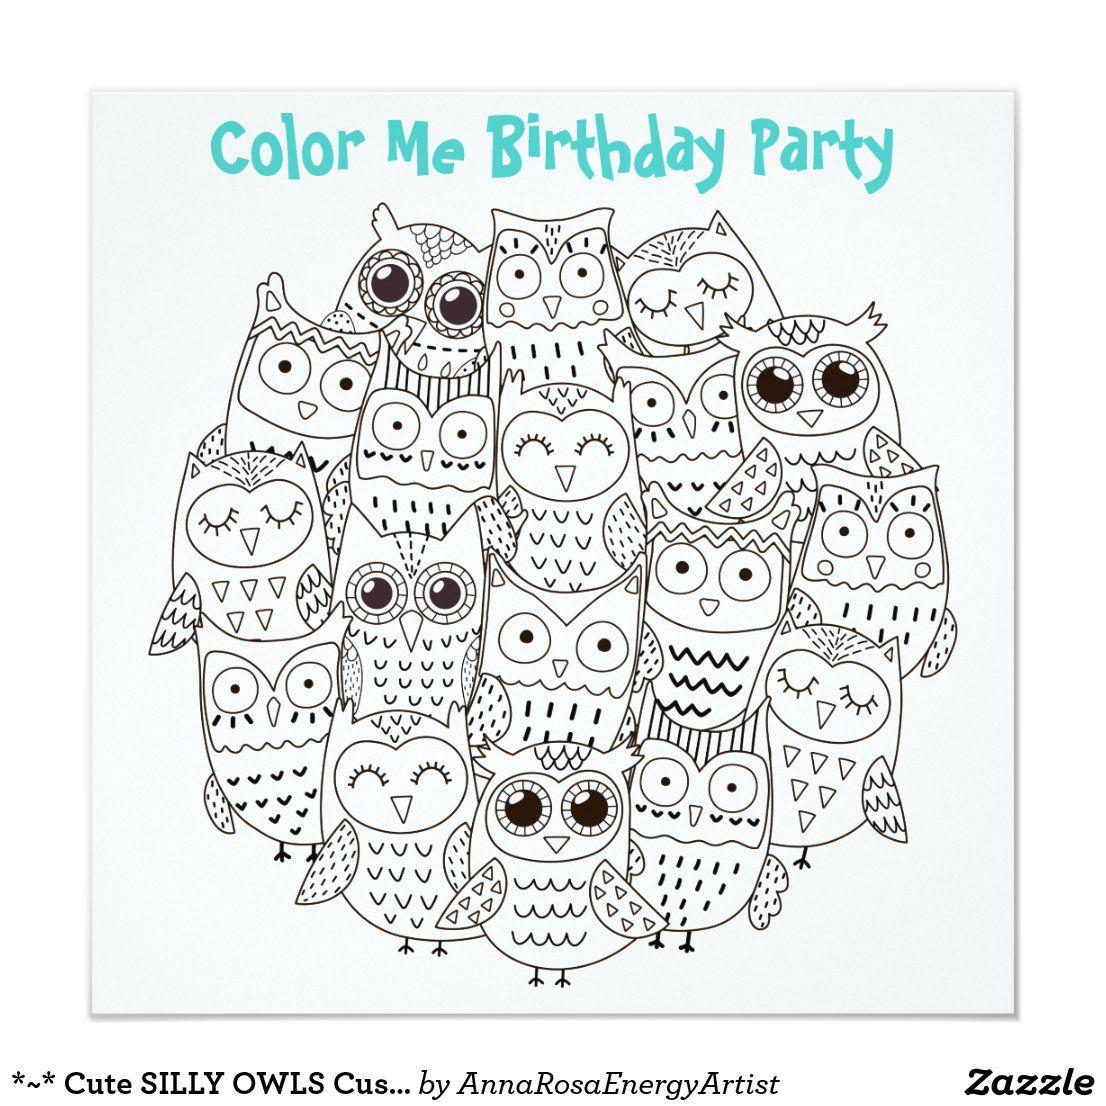 Cute Silly Owls Customizable Color Me Birthday Invitation Zazzle Com Birthday Invitations Its My Birthday Birthday Invitations Kids